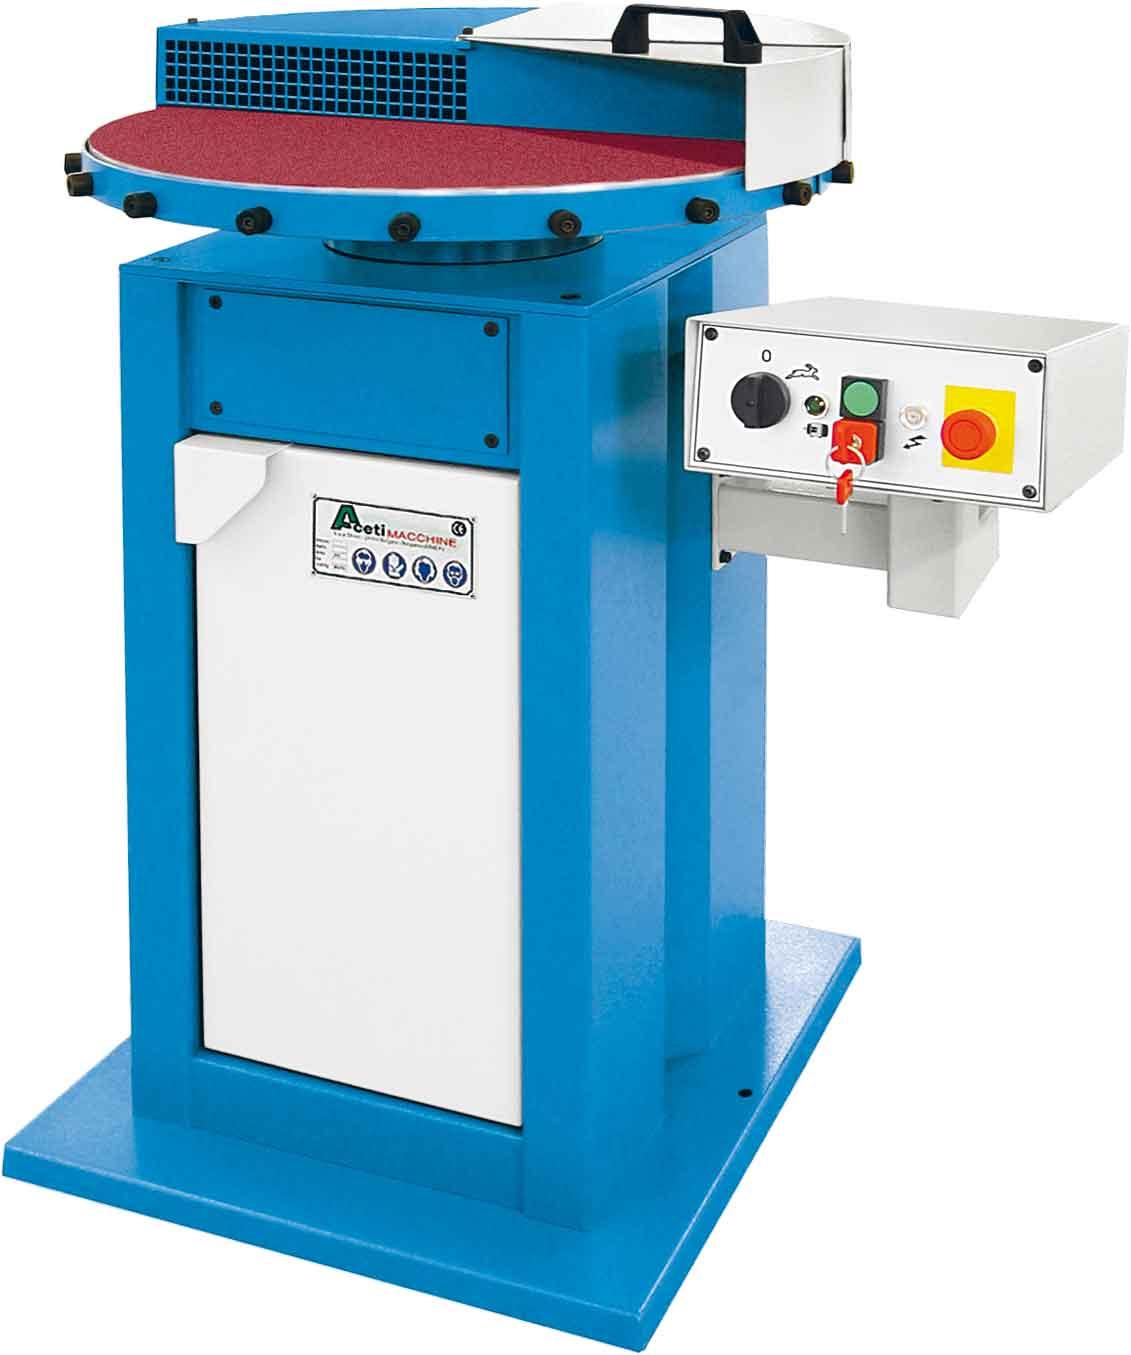 ART.98 - Disc grinding machine